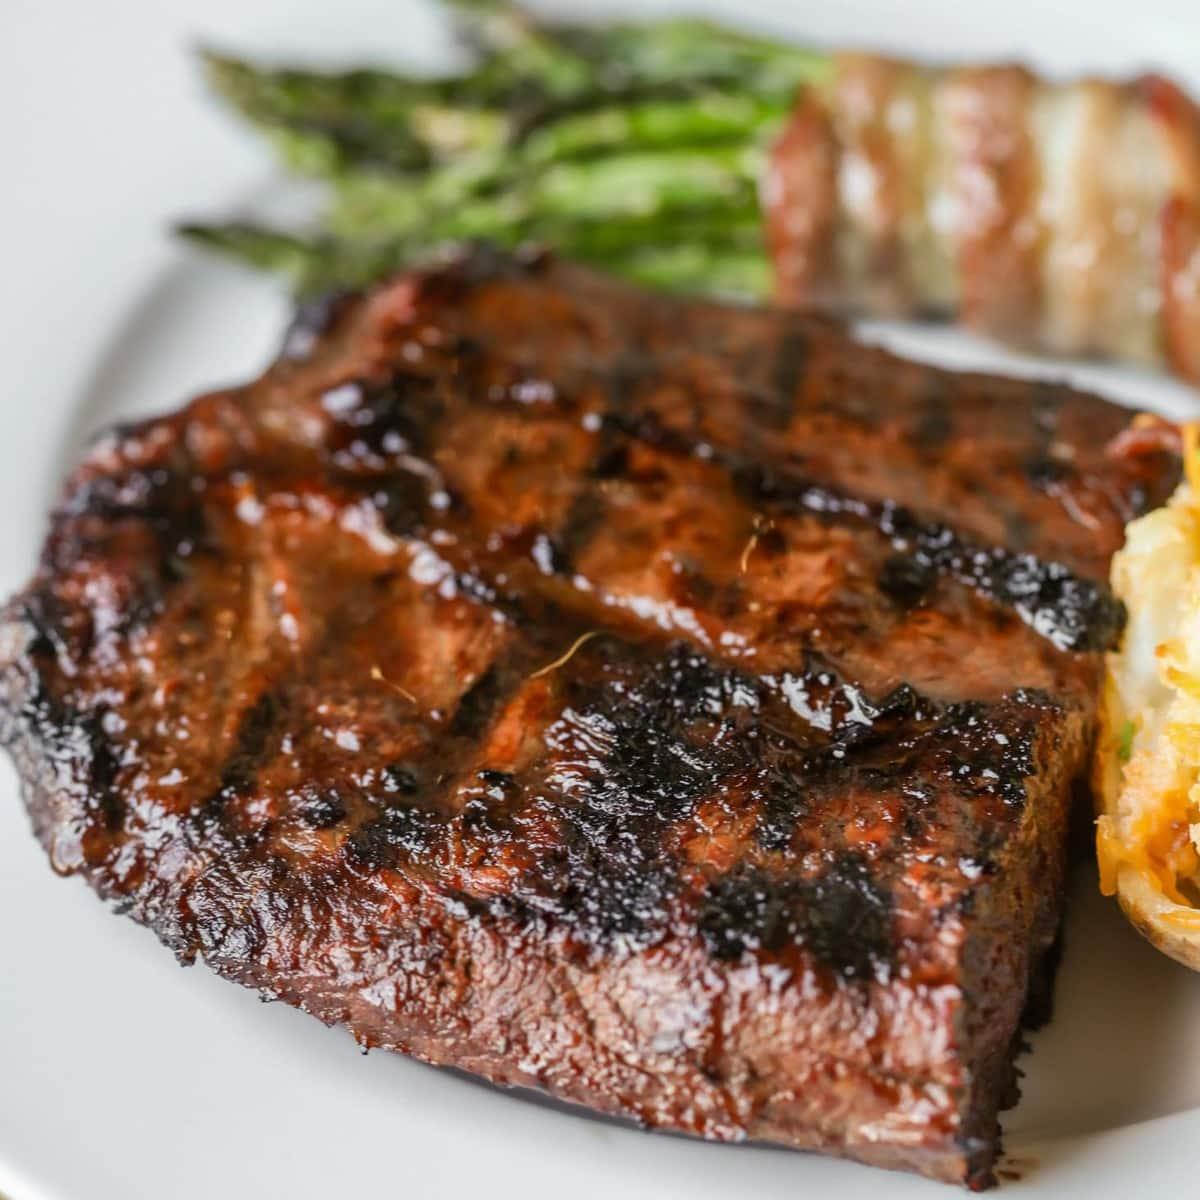 Easy Steak Marinade recipe - flat iron on plate